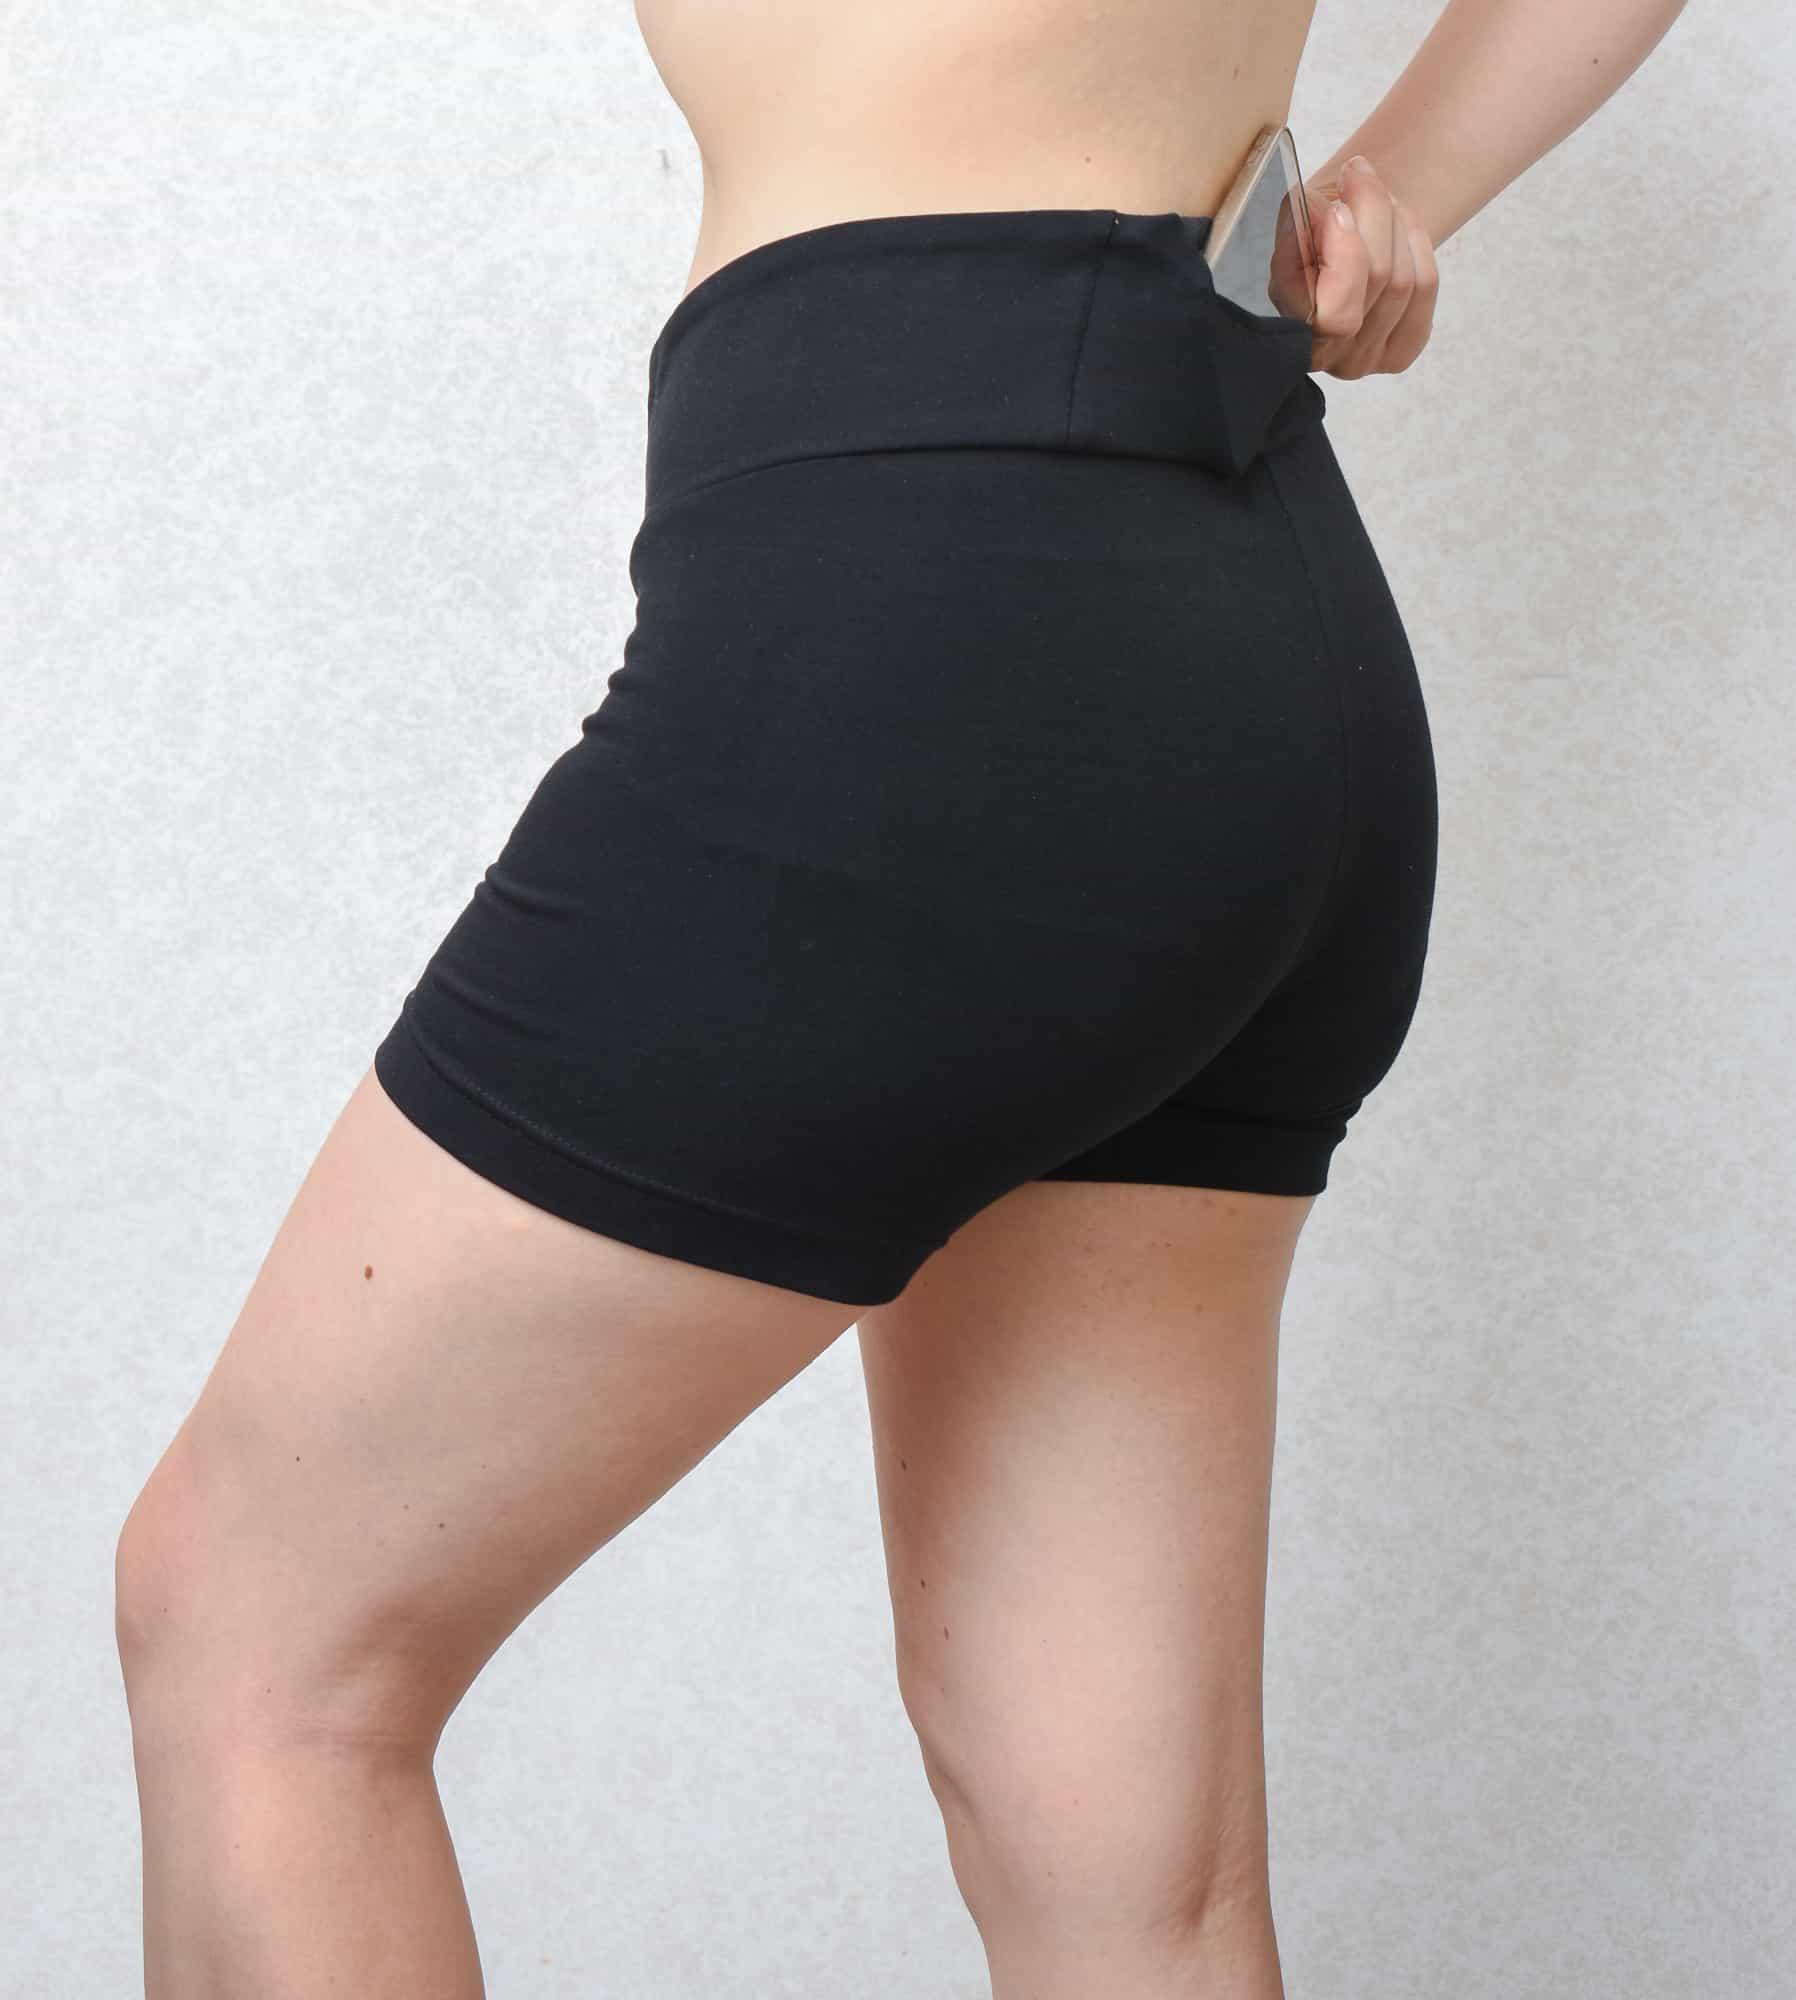 Knit shorts with waist band pocket | Last Stitch